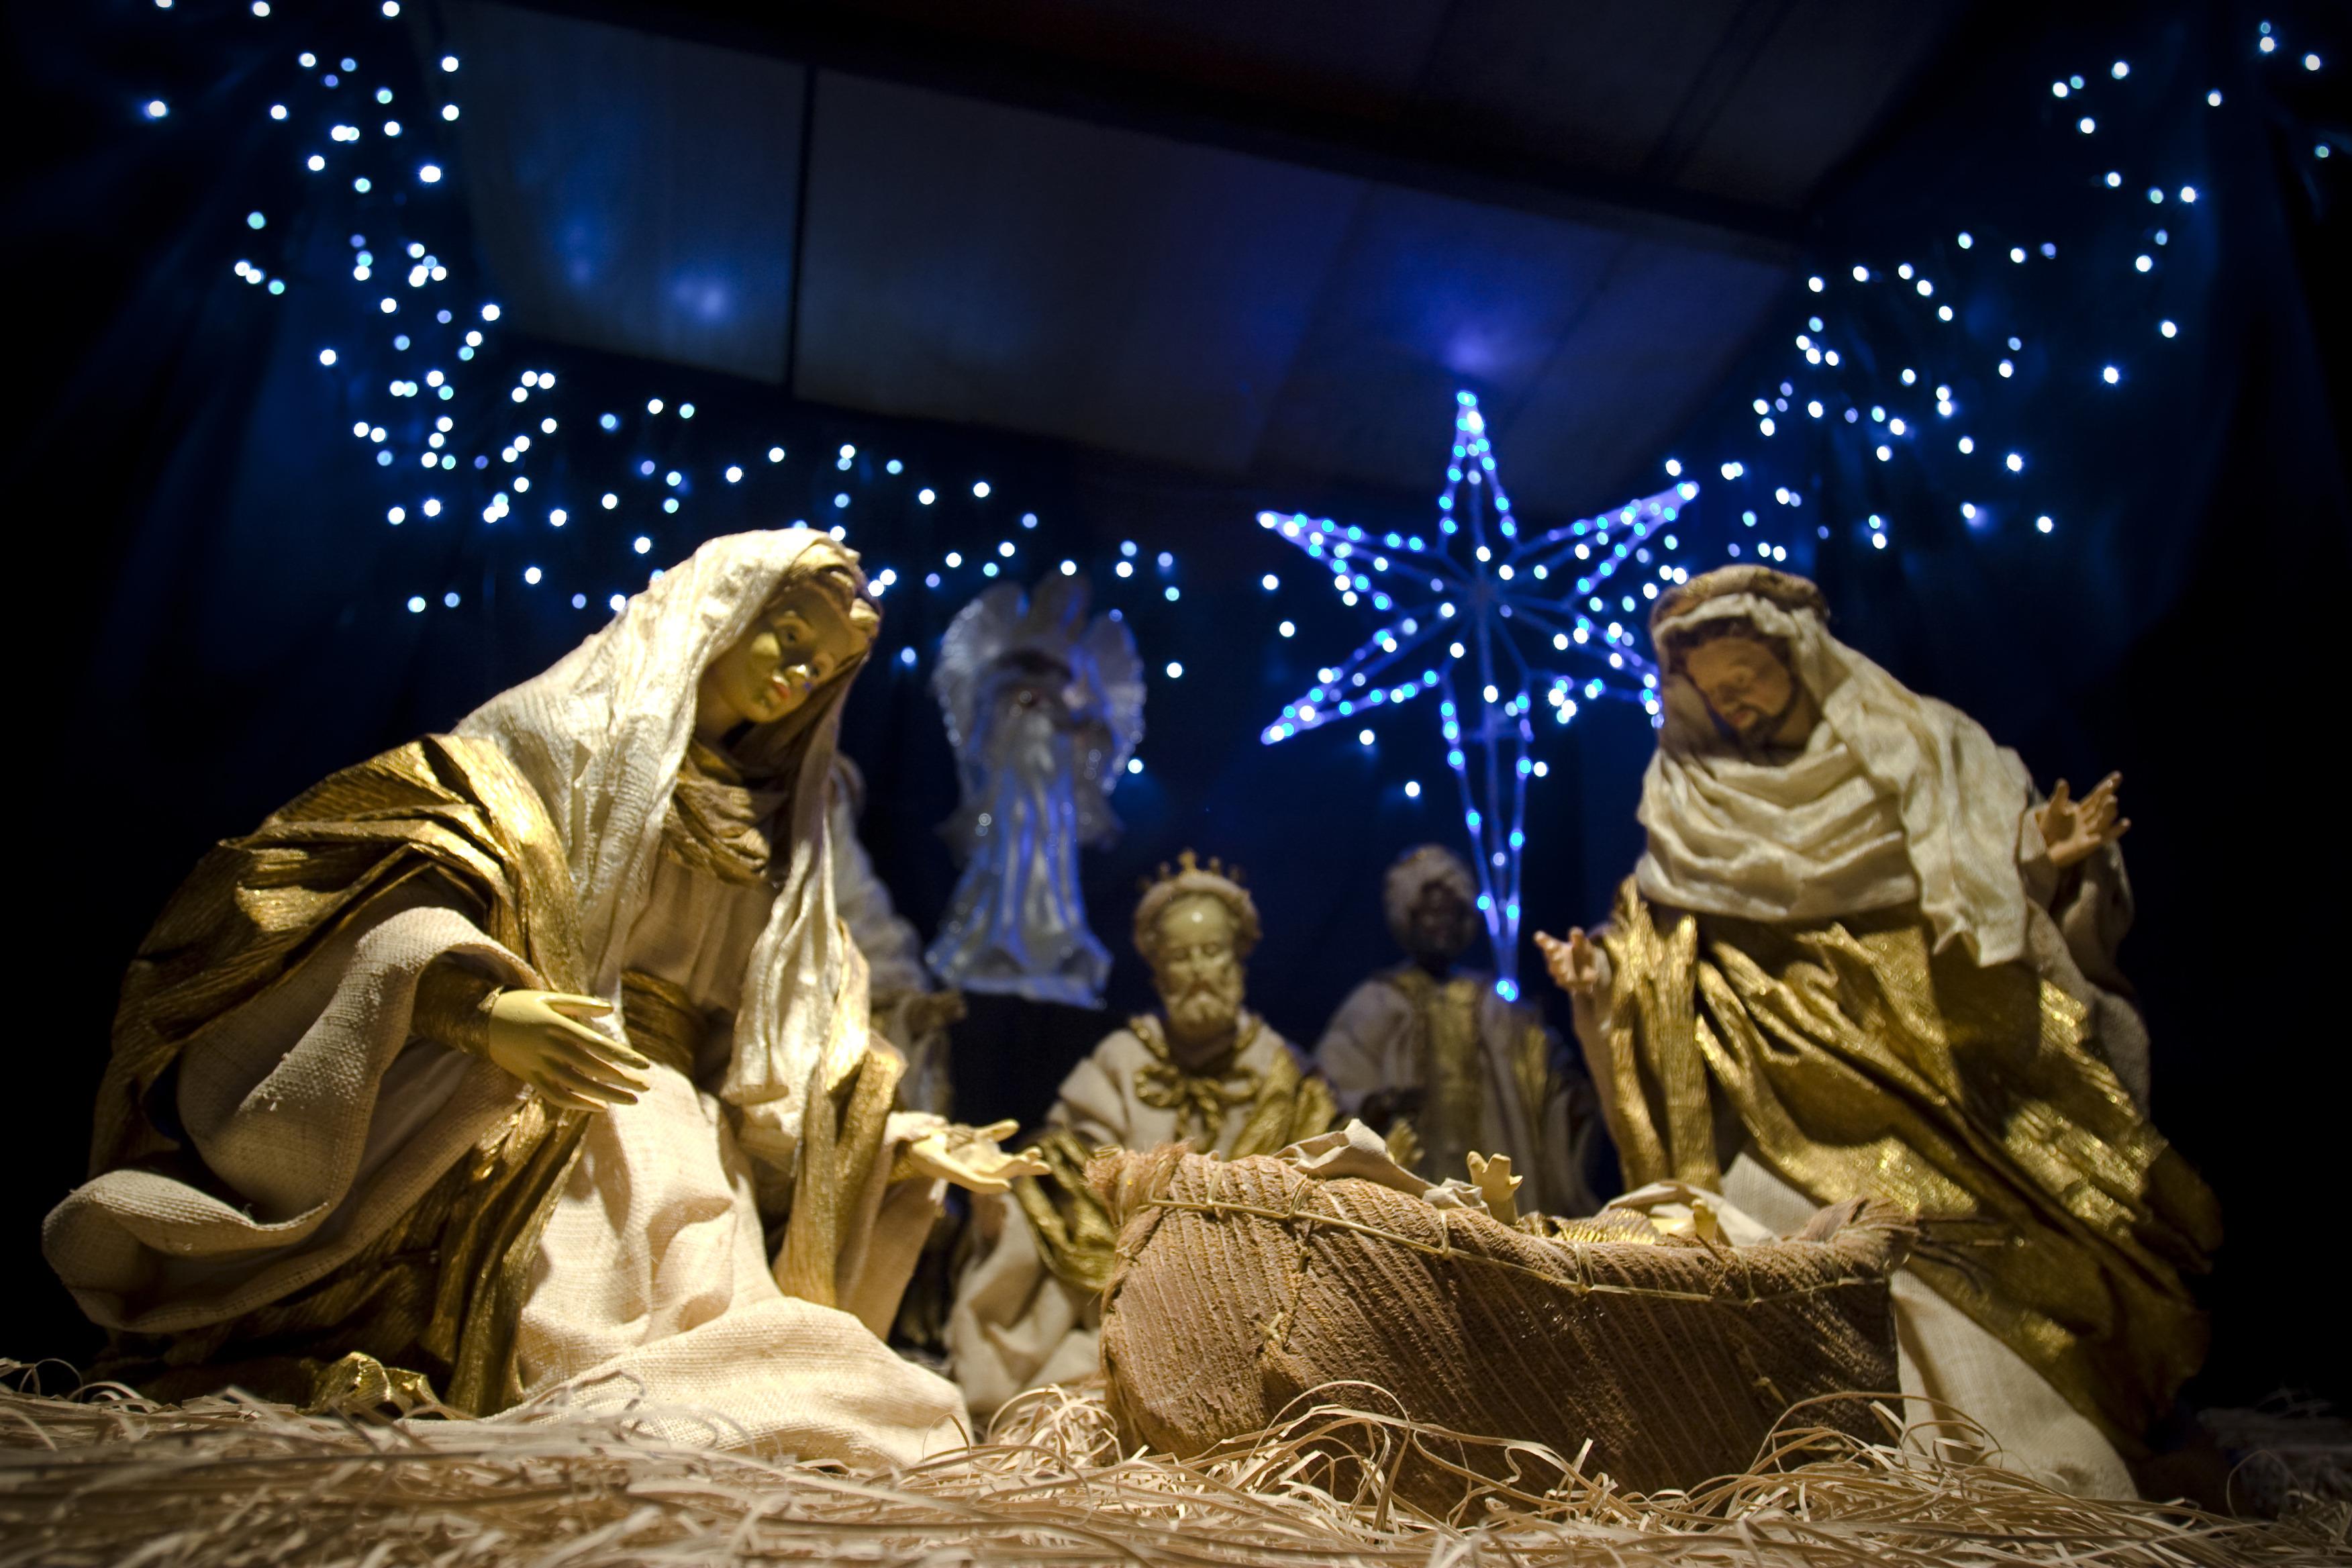 How do atheists celebrate Christmas? | SBS Life